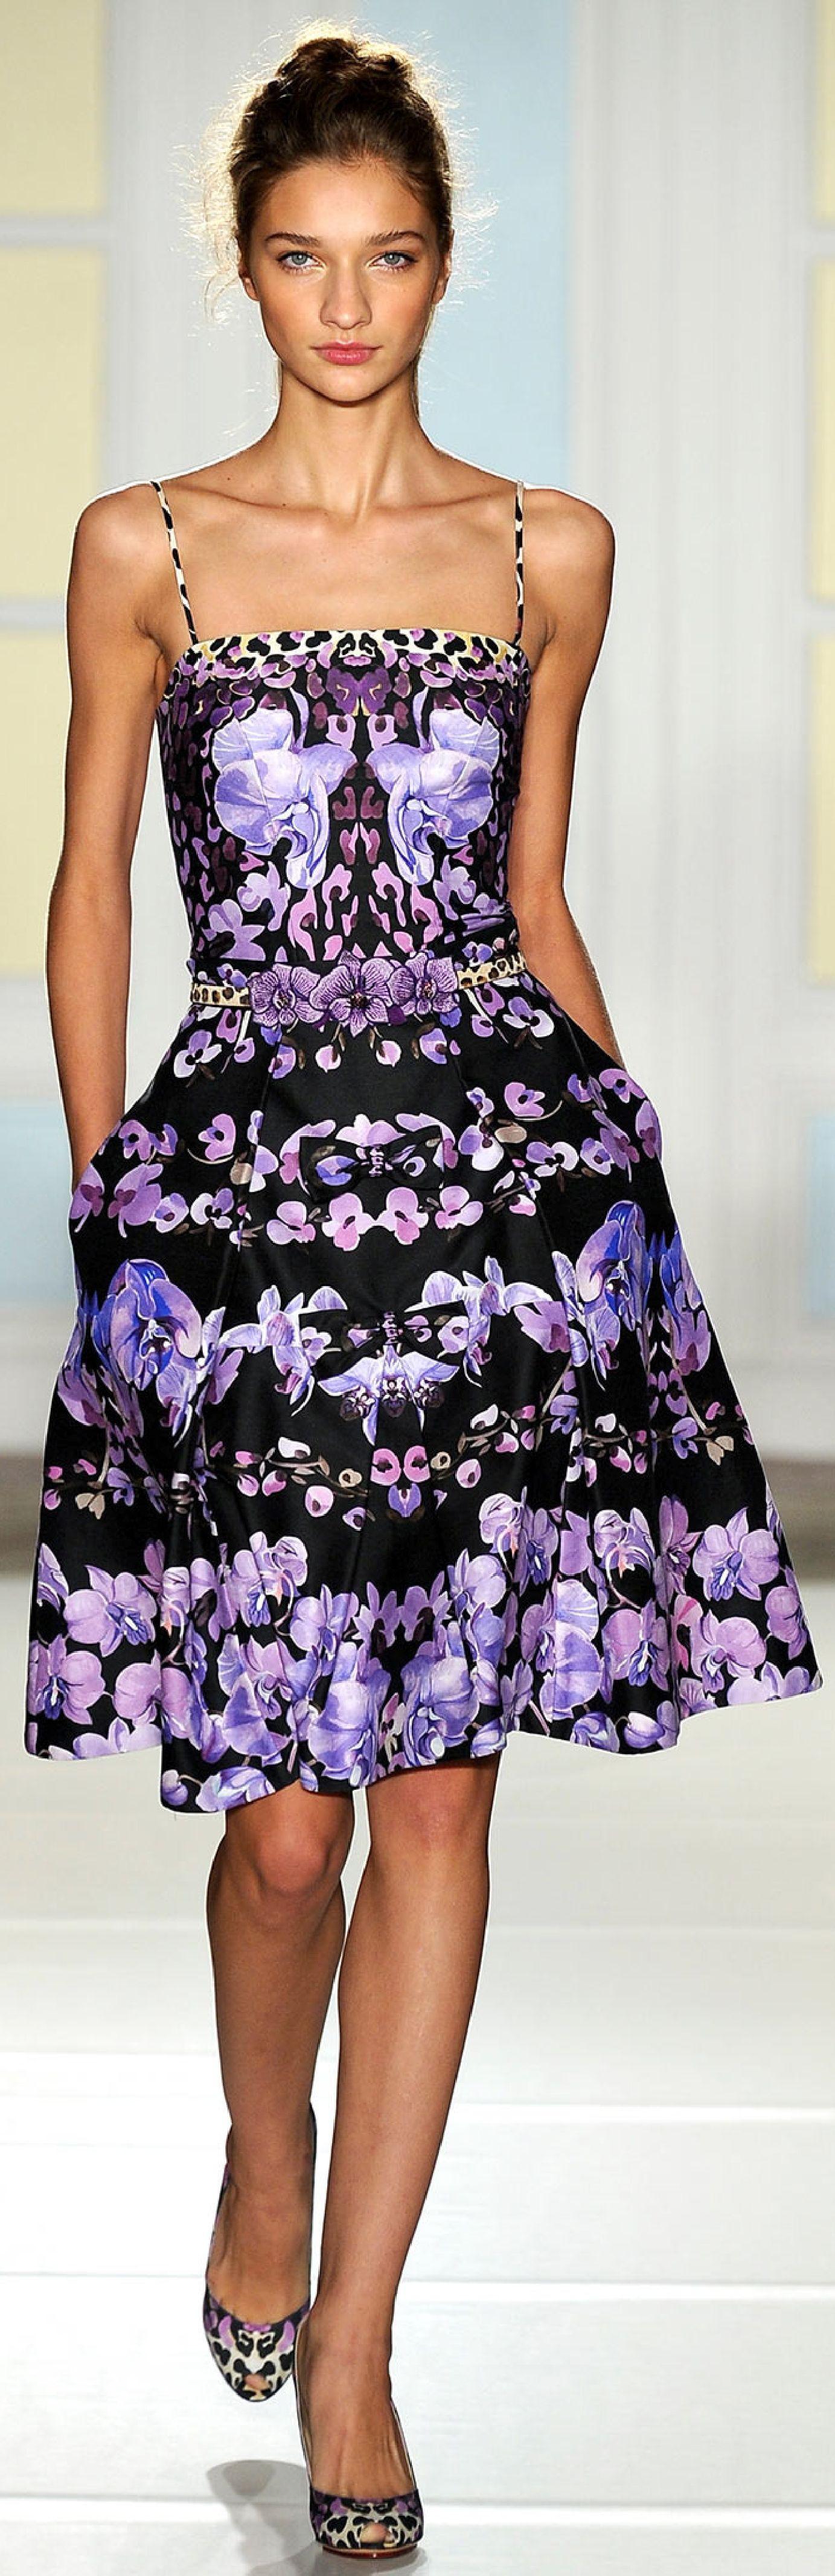 SPRING 2014 RTW Temperley London | Gowns...beautiful | Pinterest ...